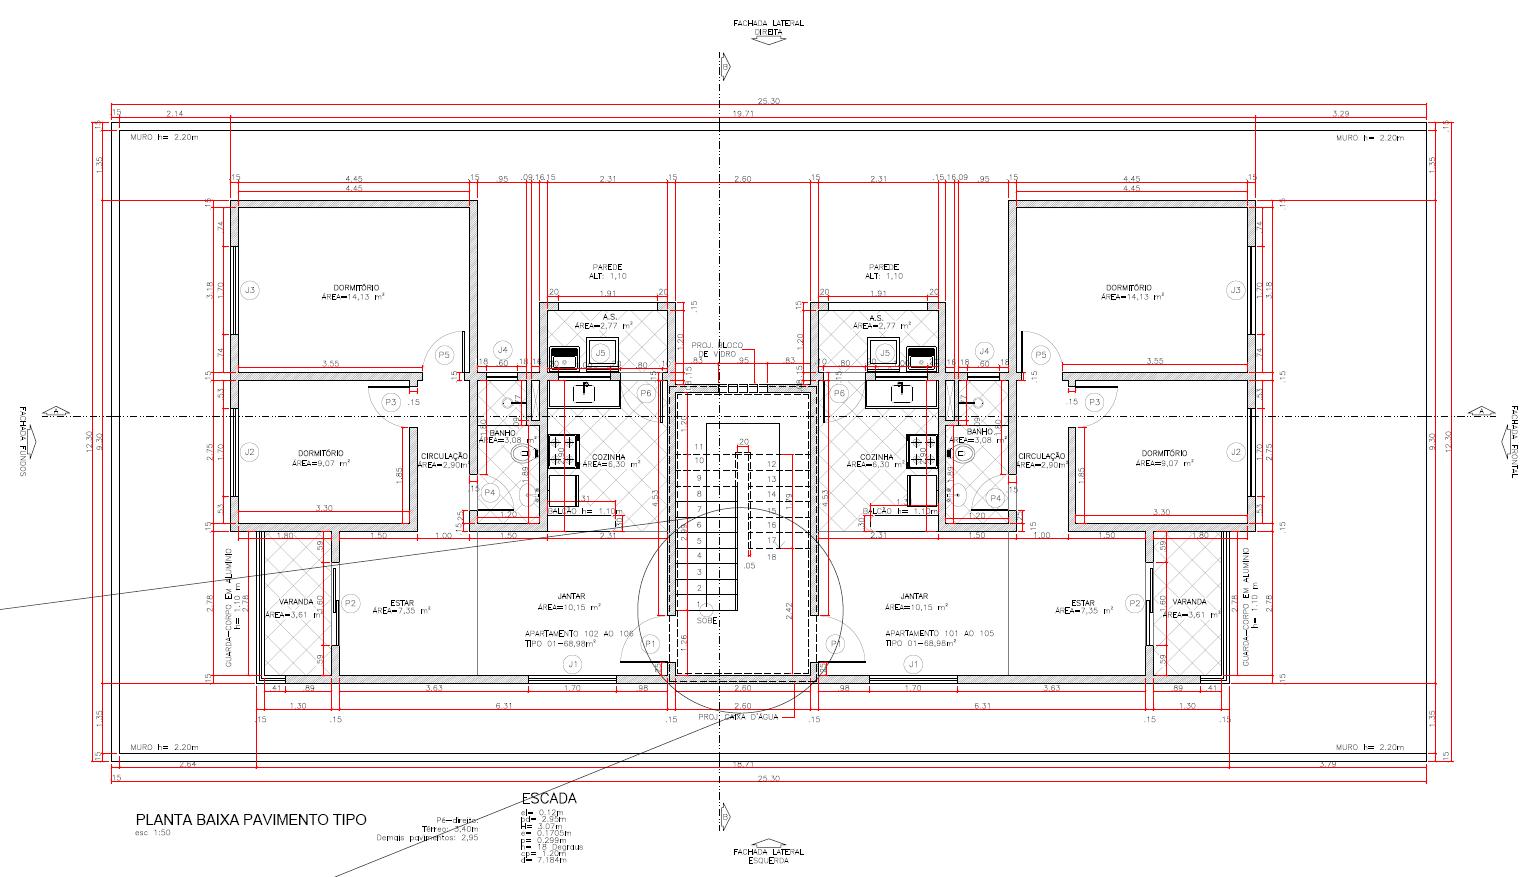 Desenhar Planta Baixa Gratis Planta Baixa Do Pavimento Tipo Ideias Para A Casa